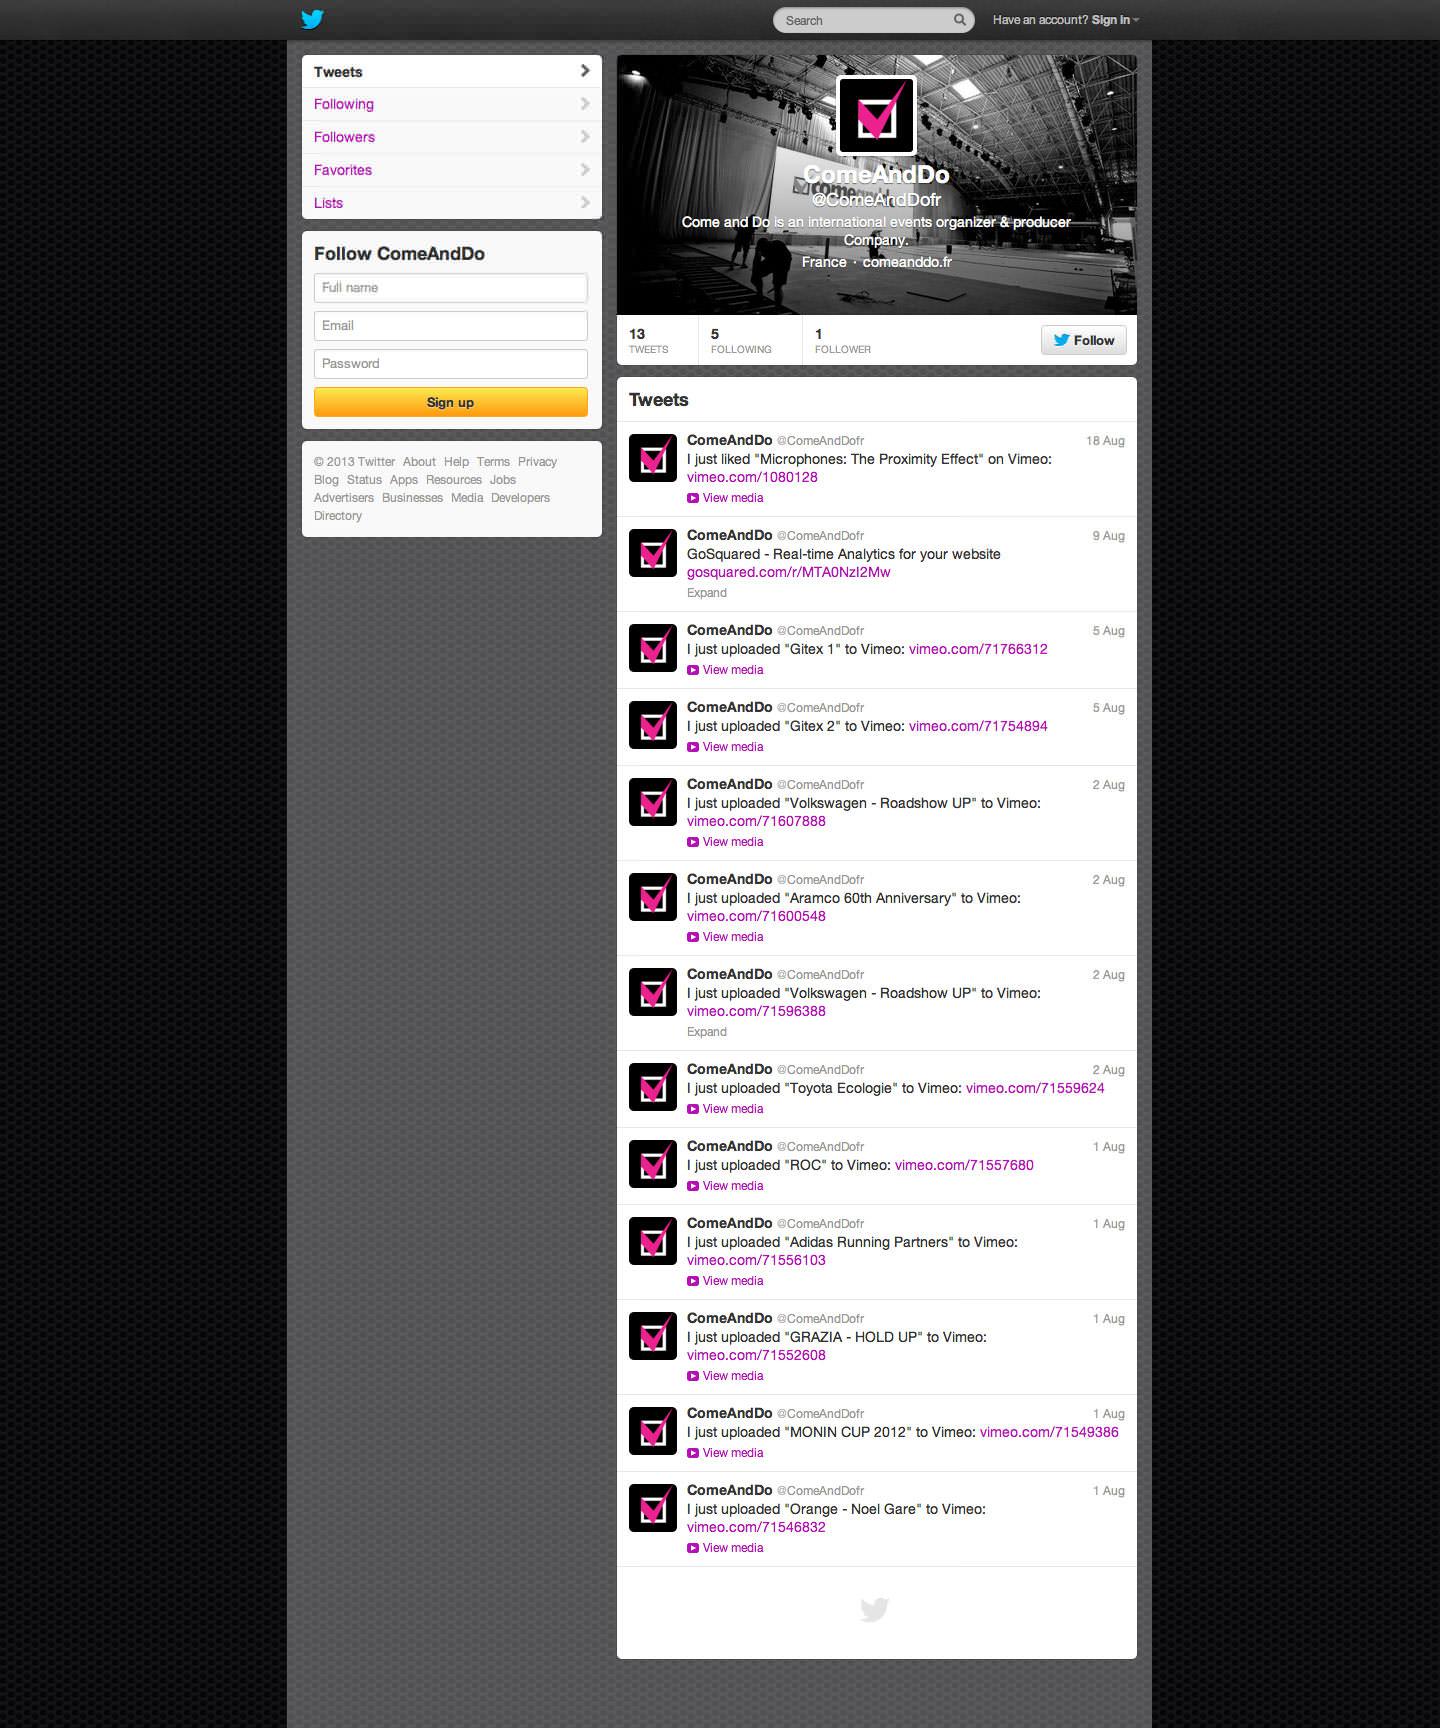 ComeAndDo-(ComeAndDofr)-on-Twitter.jpg